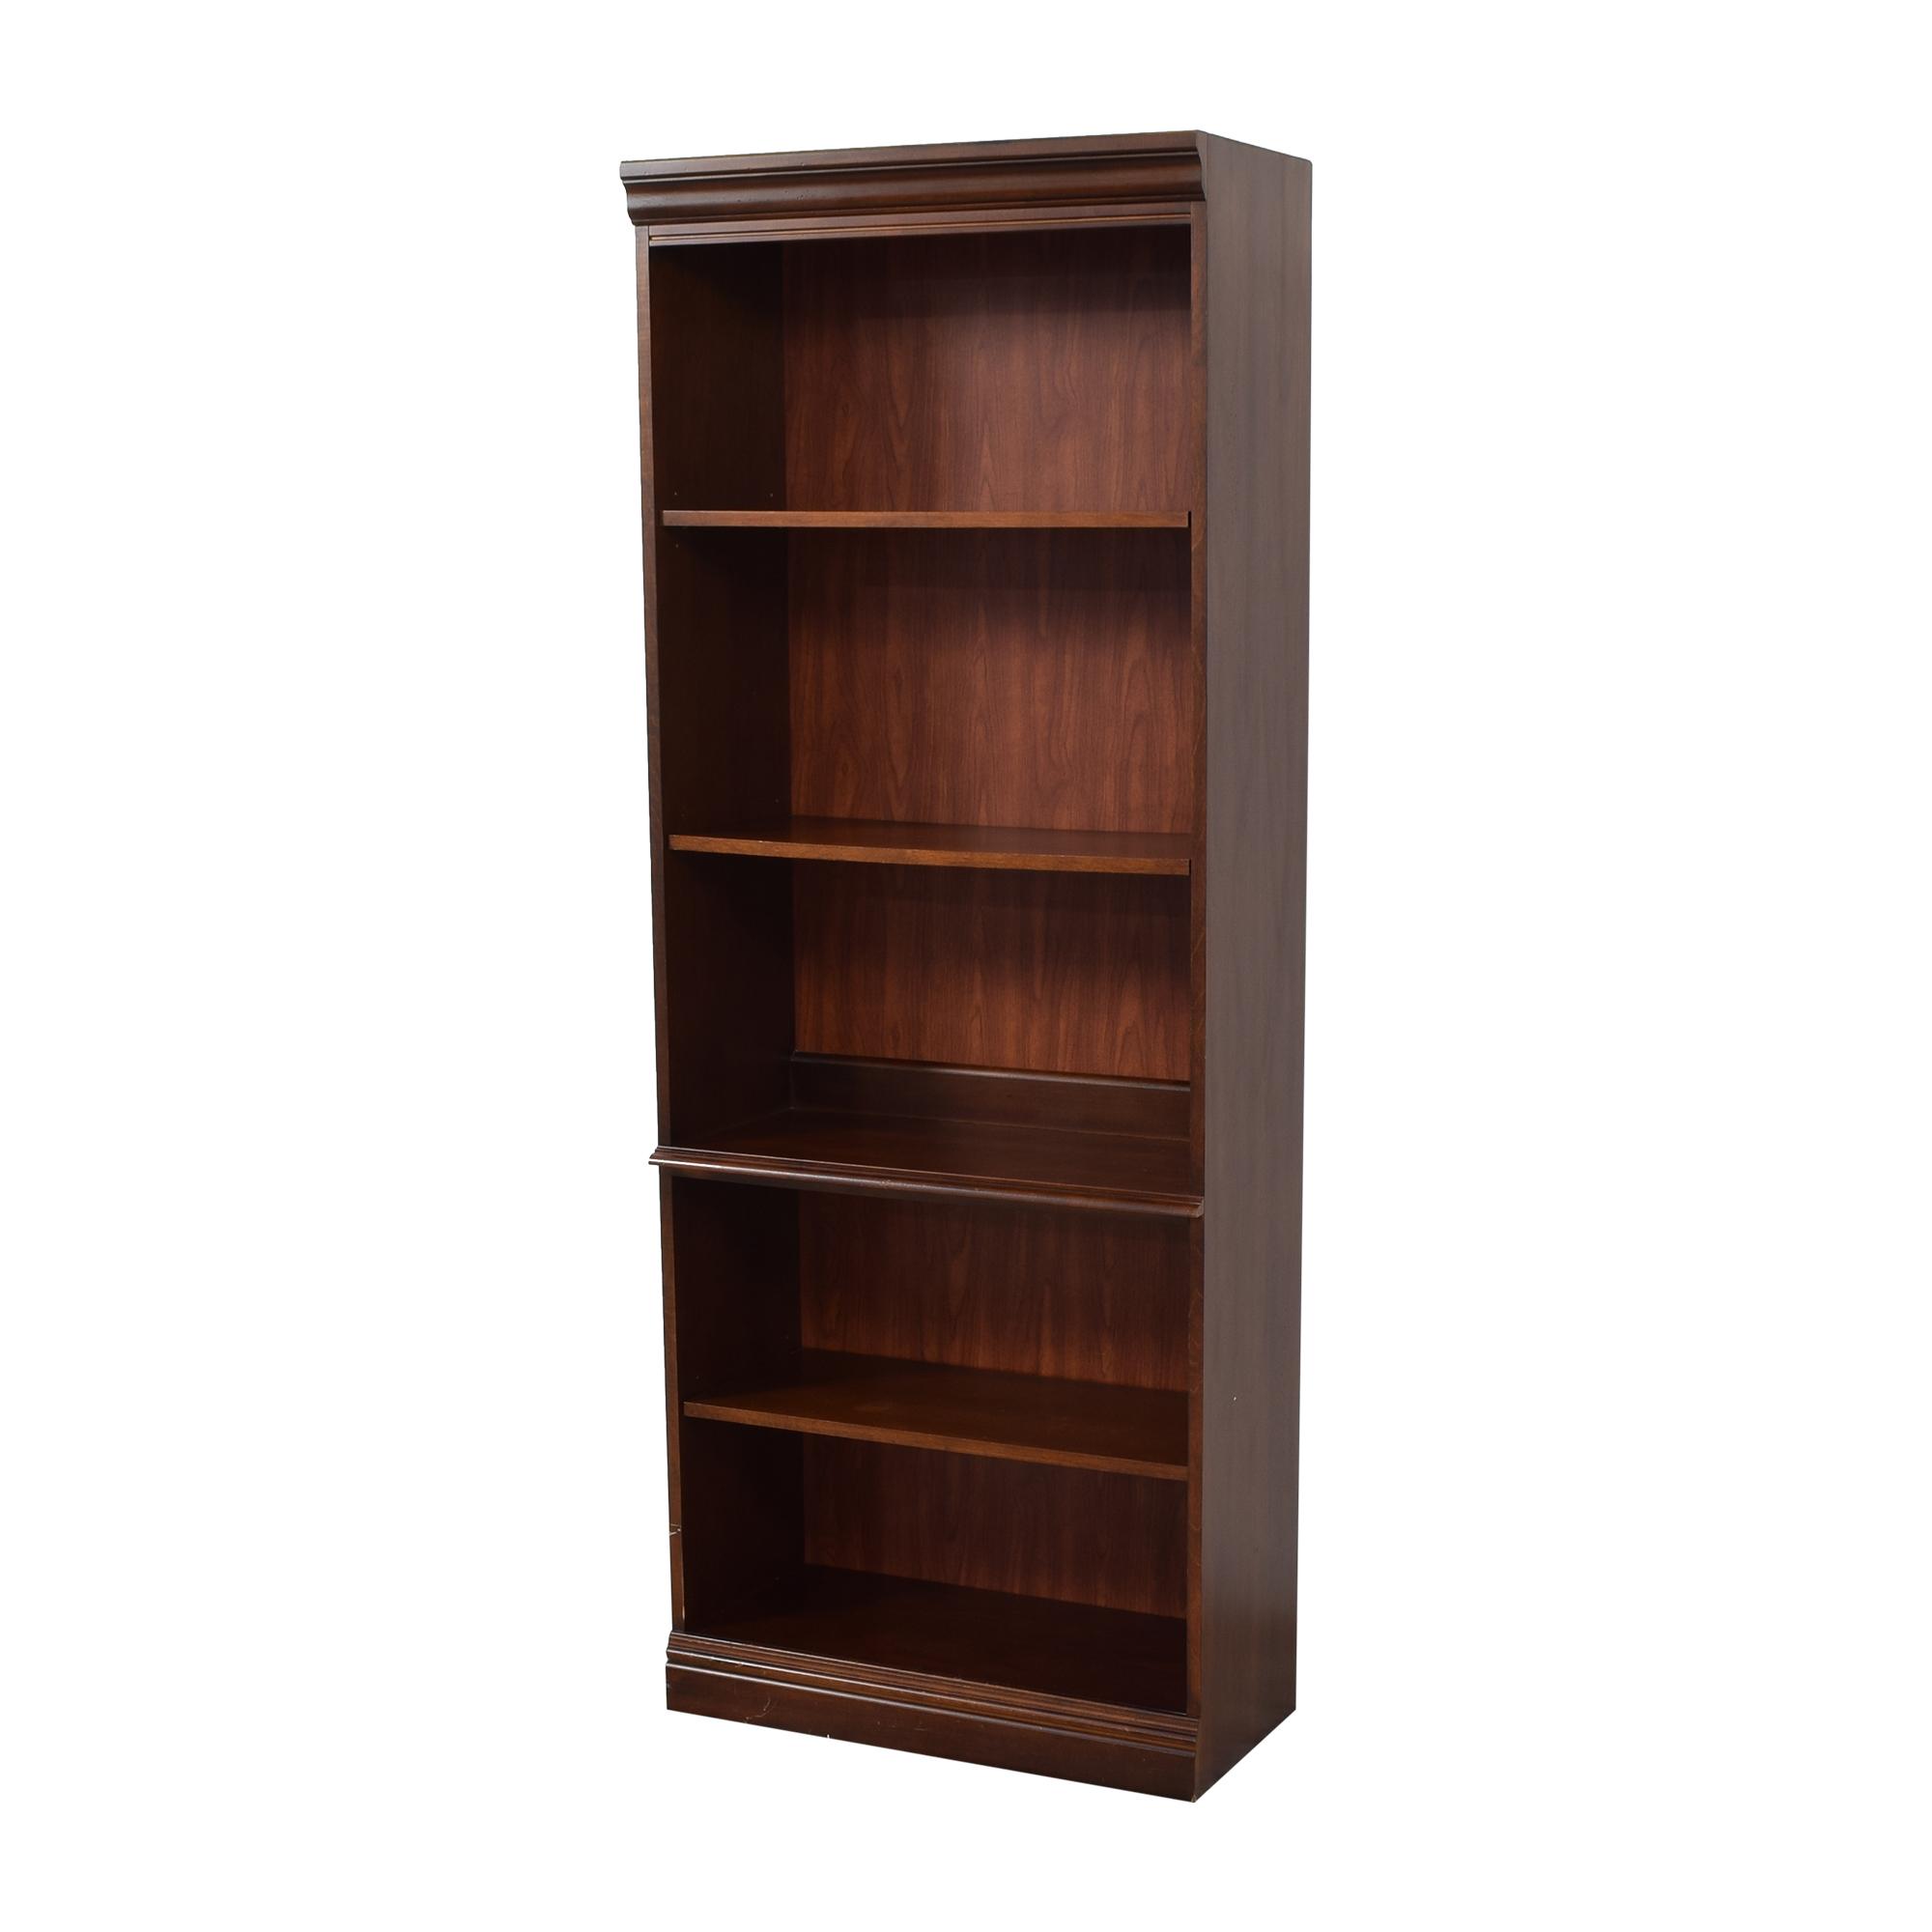 Hooker Furniture Tall Bookcase Hooker Furniture